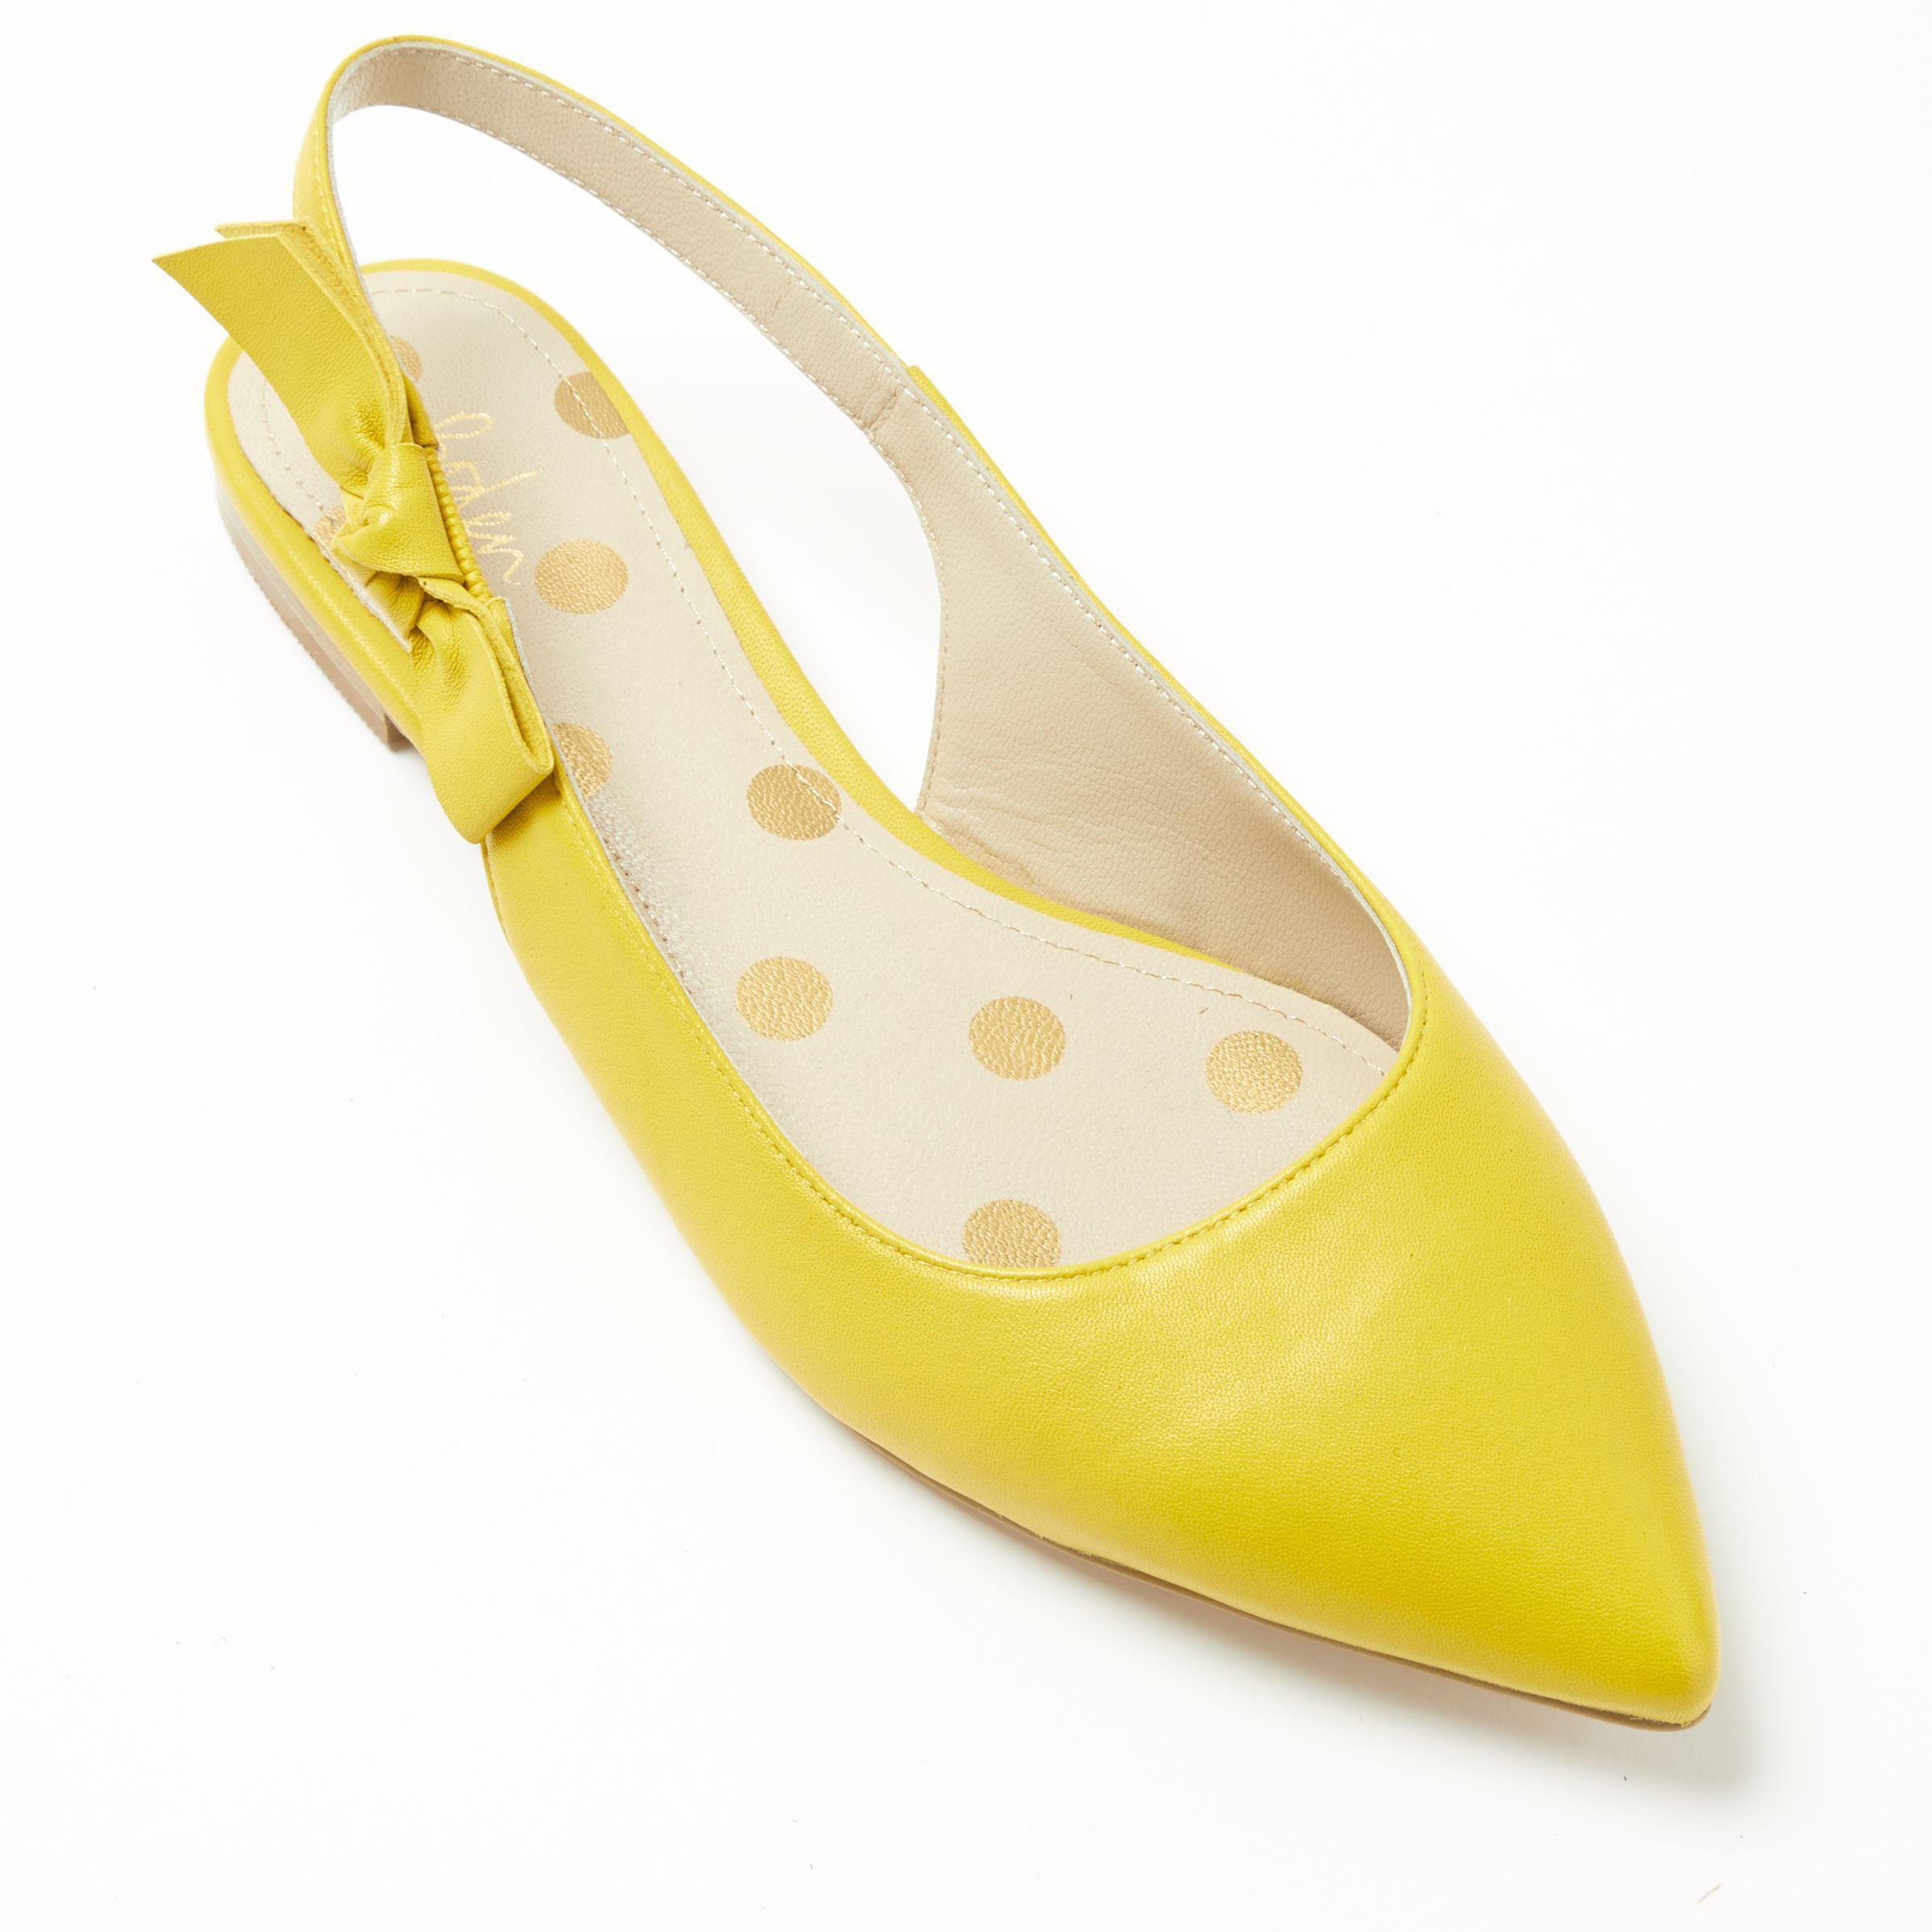 4da9a4dedcb Boden Hilary Slingback Pumps in Yellow - Lyst